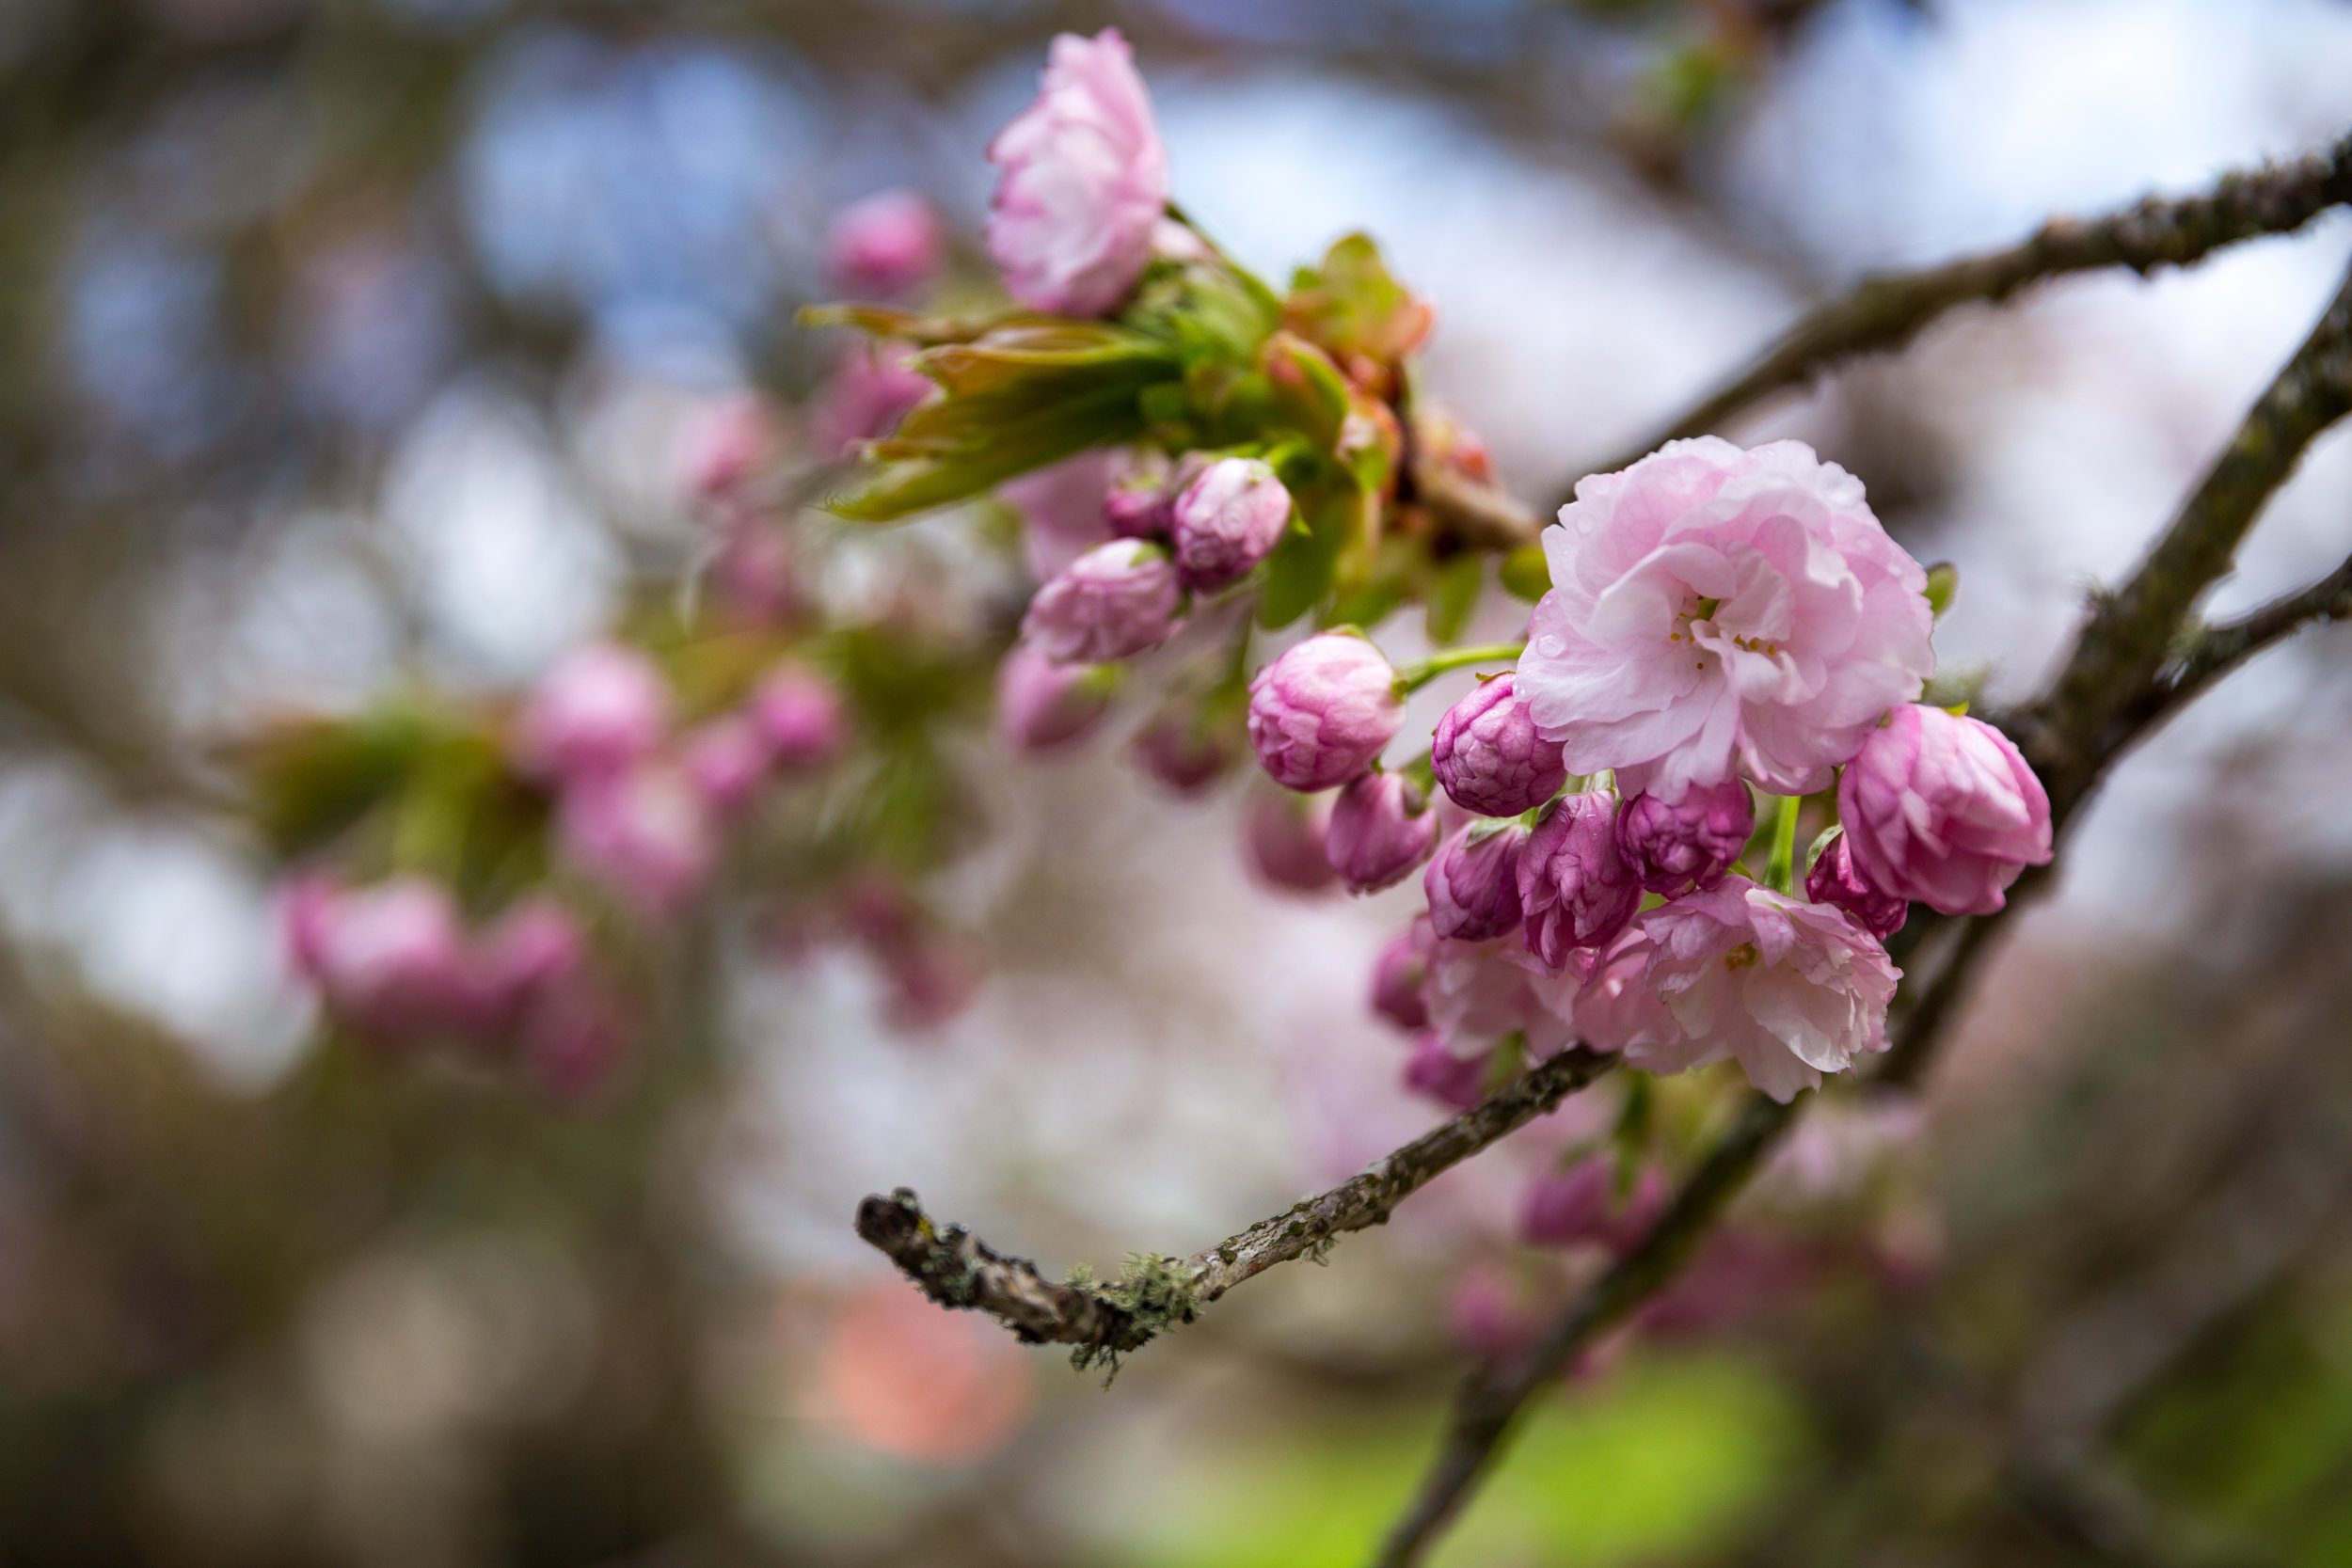 4 april 12th 2018 point defiance flowers flowering trees 5 stars-44.jpg